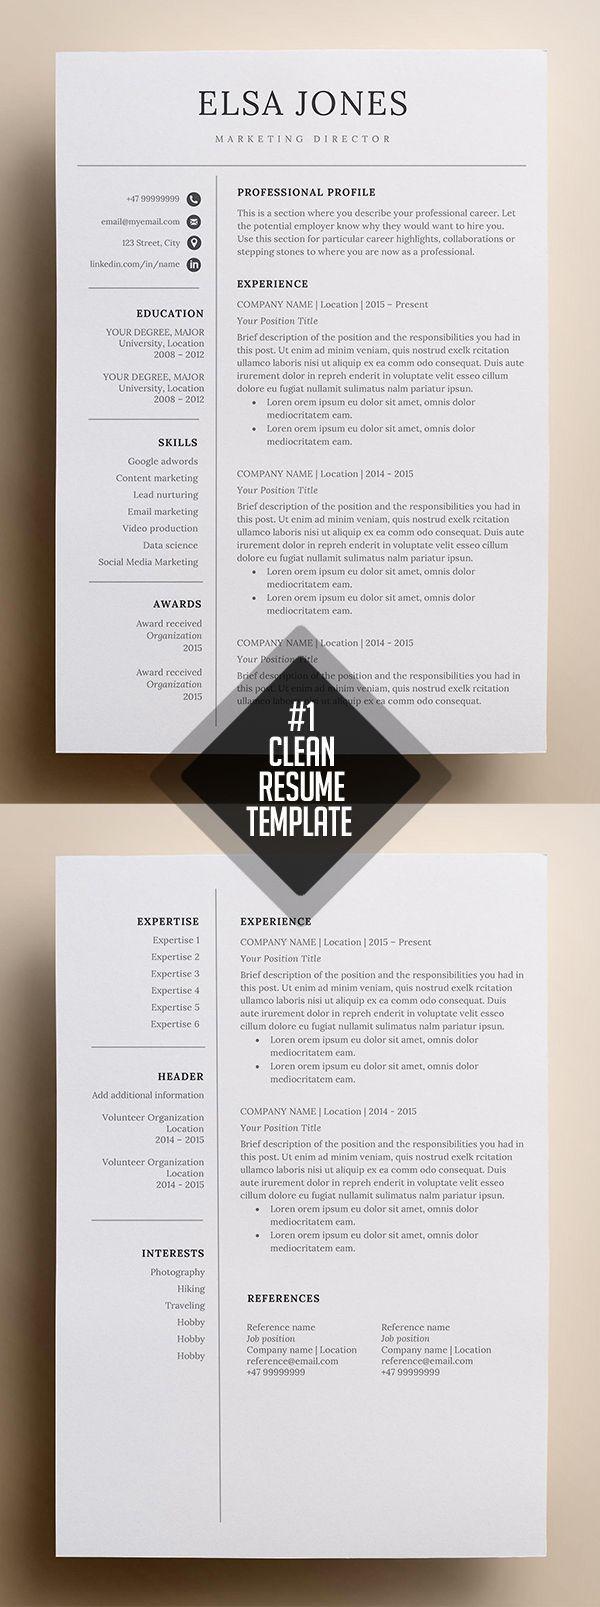 26 Clean And Minimal Resume Templates In 2020 Minimal Resume Template Minimalist Resume Template Minimal Resume